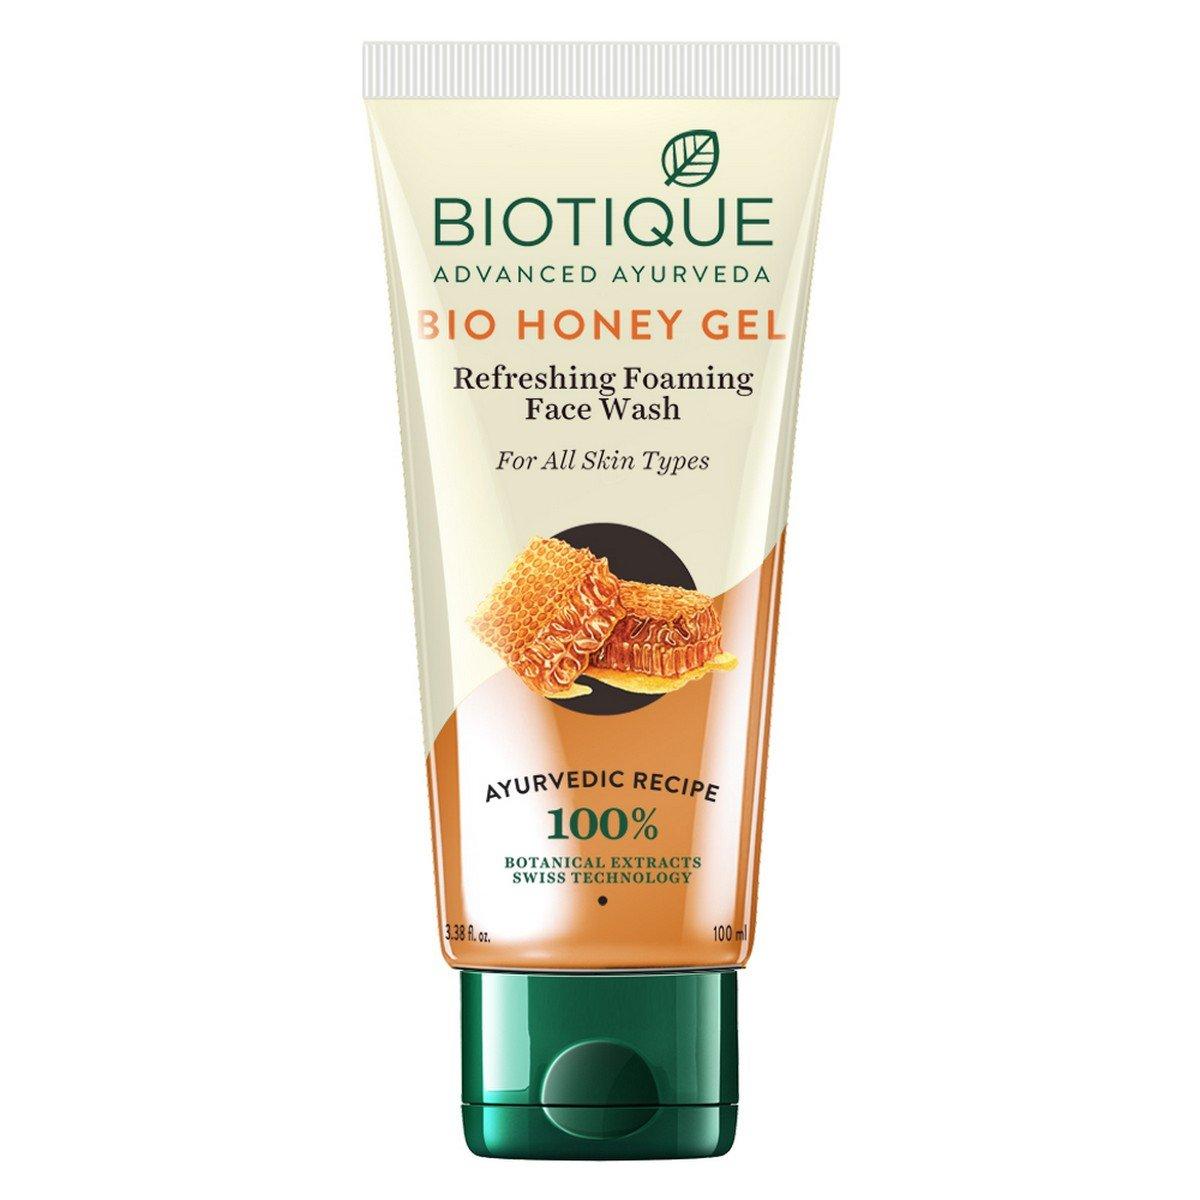 Biotique BIO Honey Gel Face Wash for All Skin Types, 100 ml